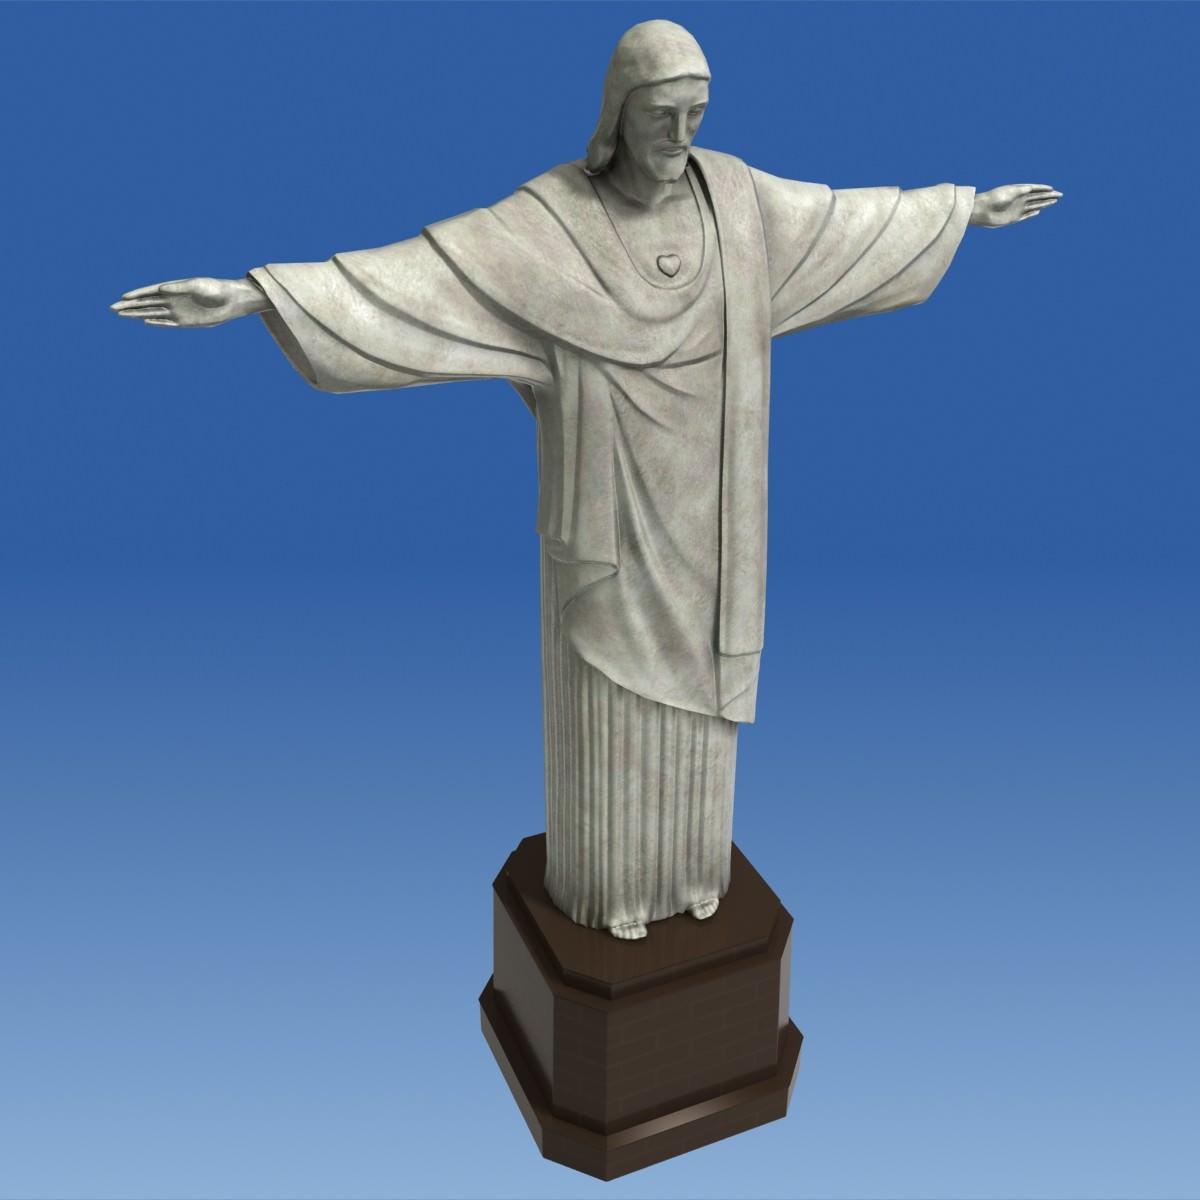 Christ Redeemer Statue 3d Model Game Ready Max Obj Fbx